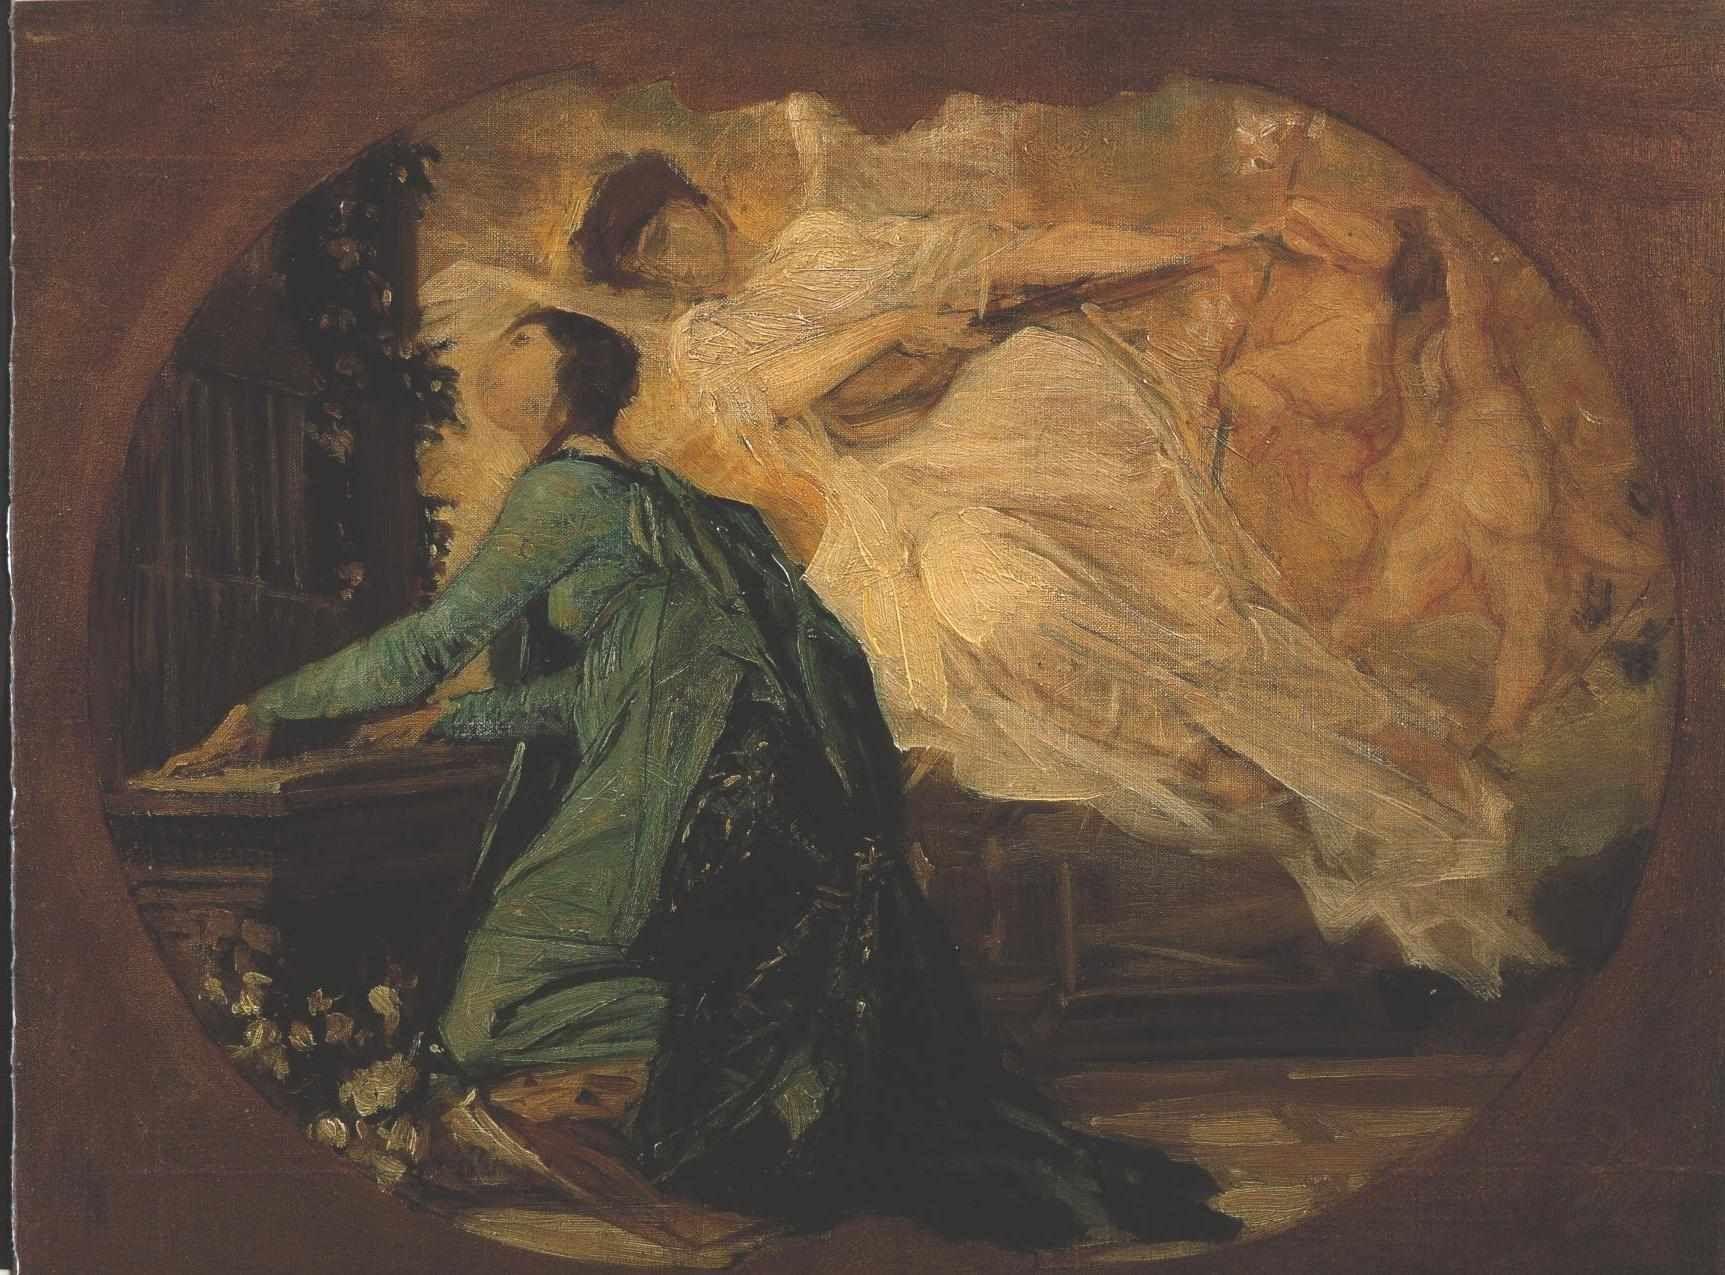 Female organ player by @artistgklimt #symbolism